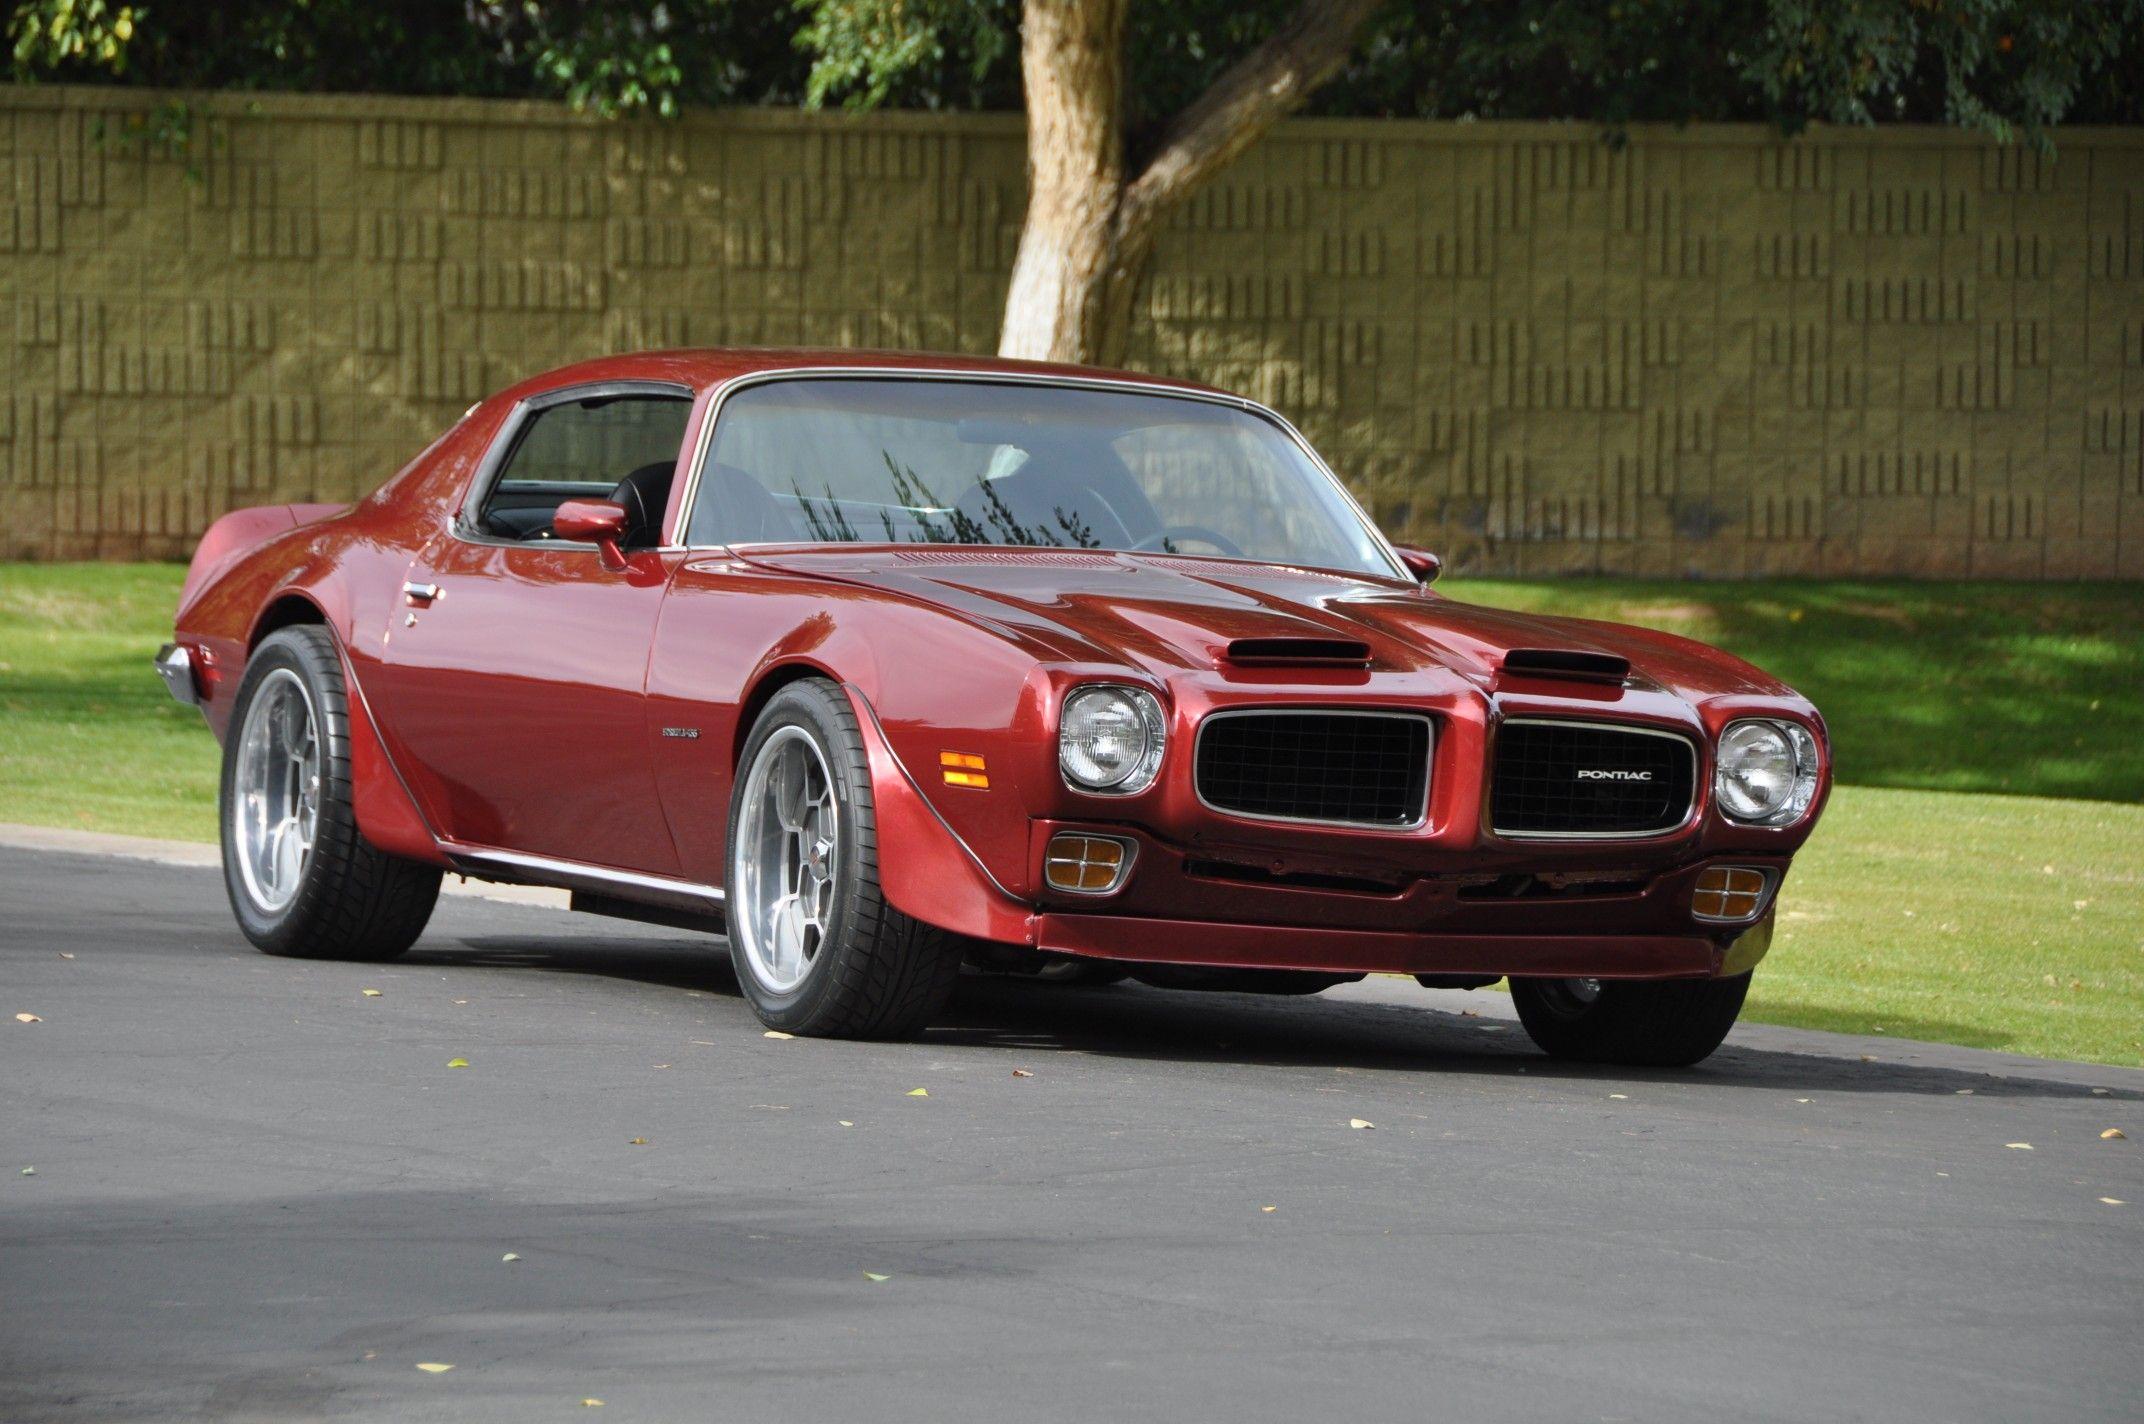 1973 Pontiac Firebird Formula 455 Source Russo And Steele